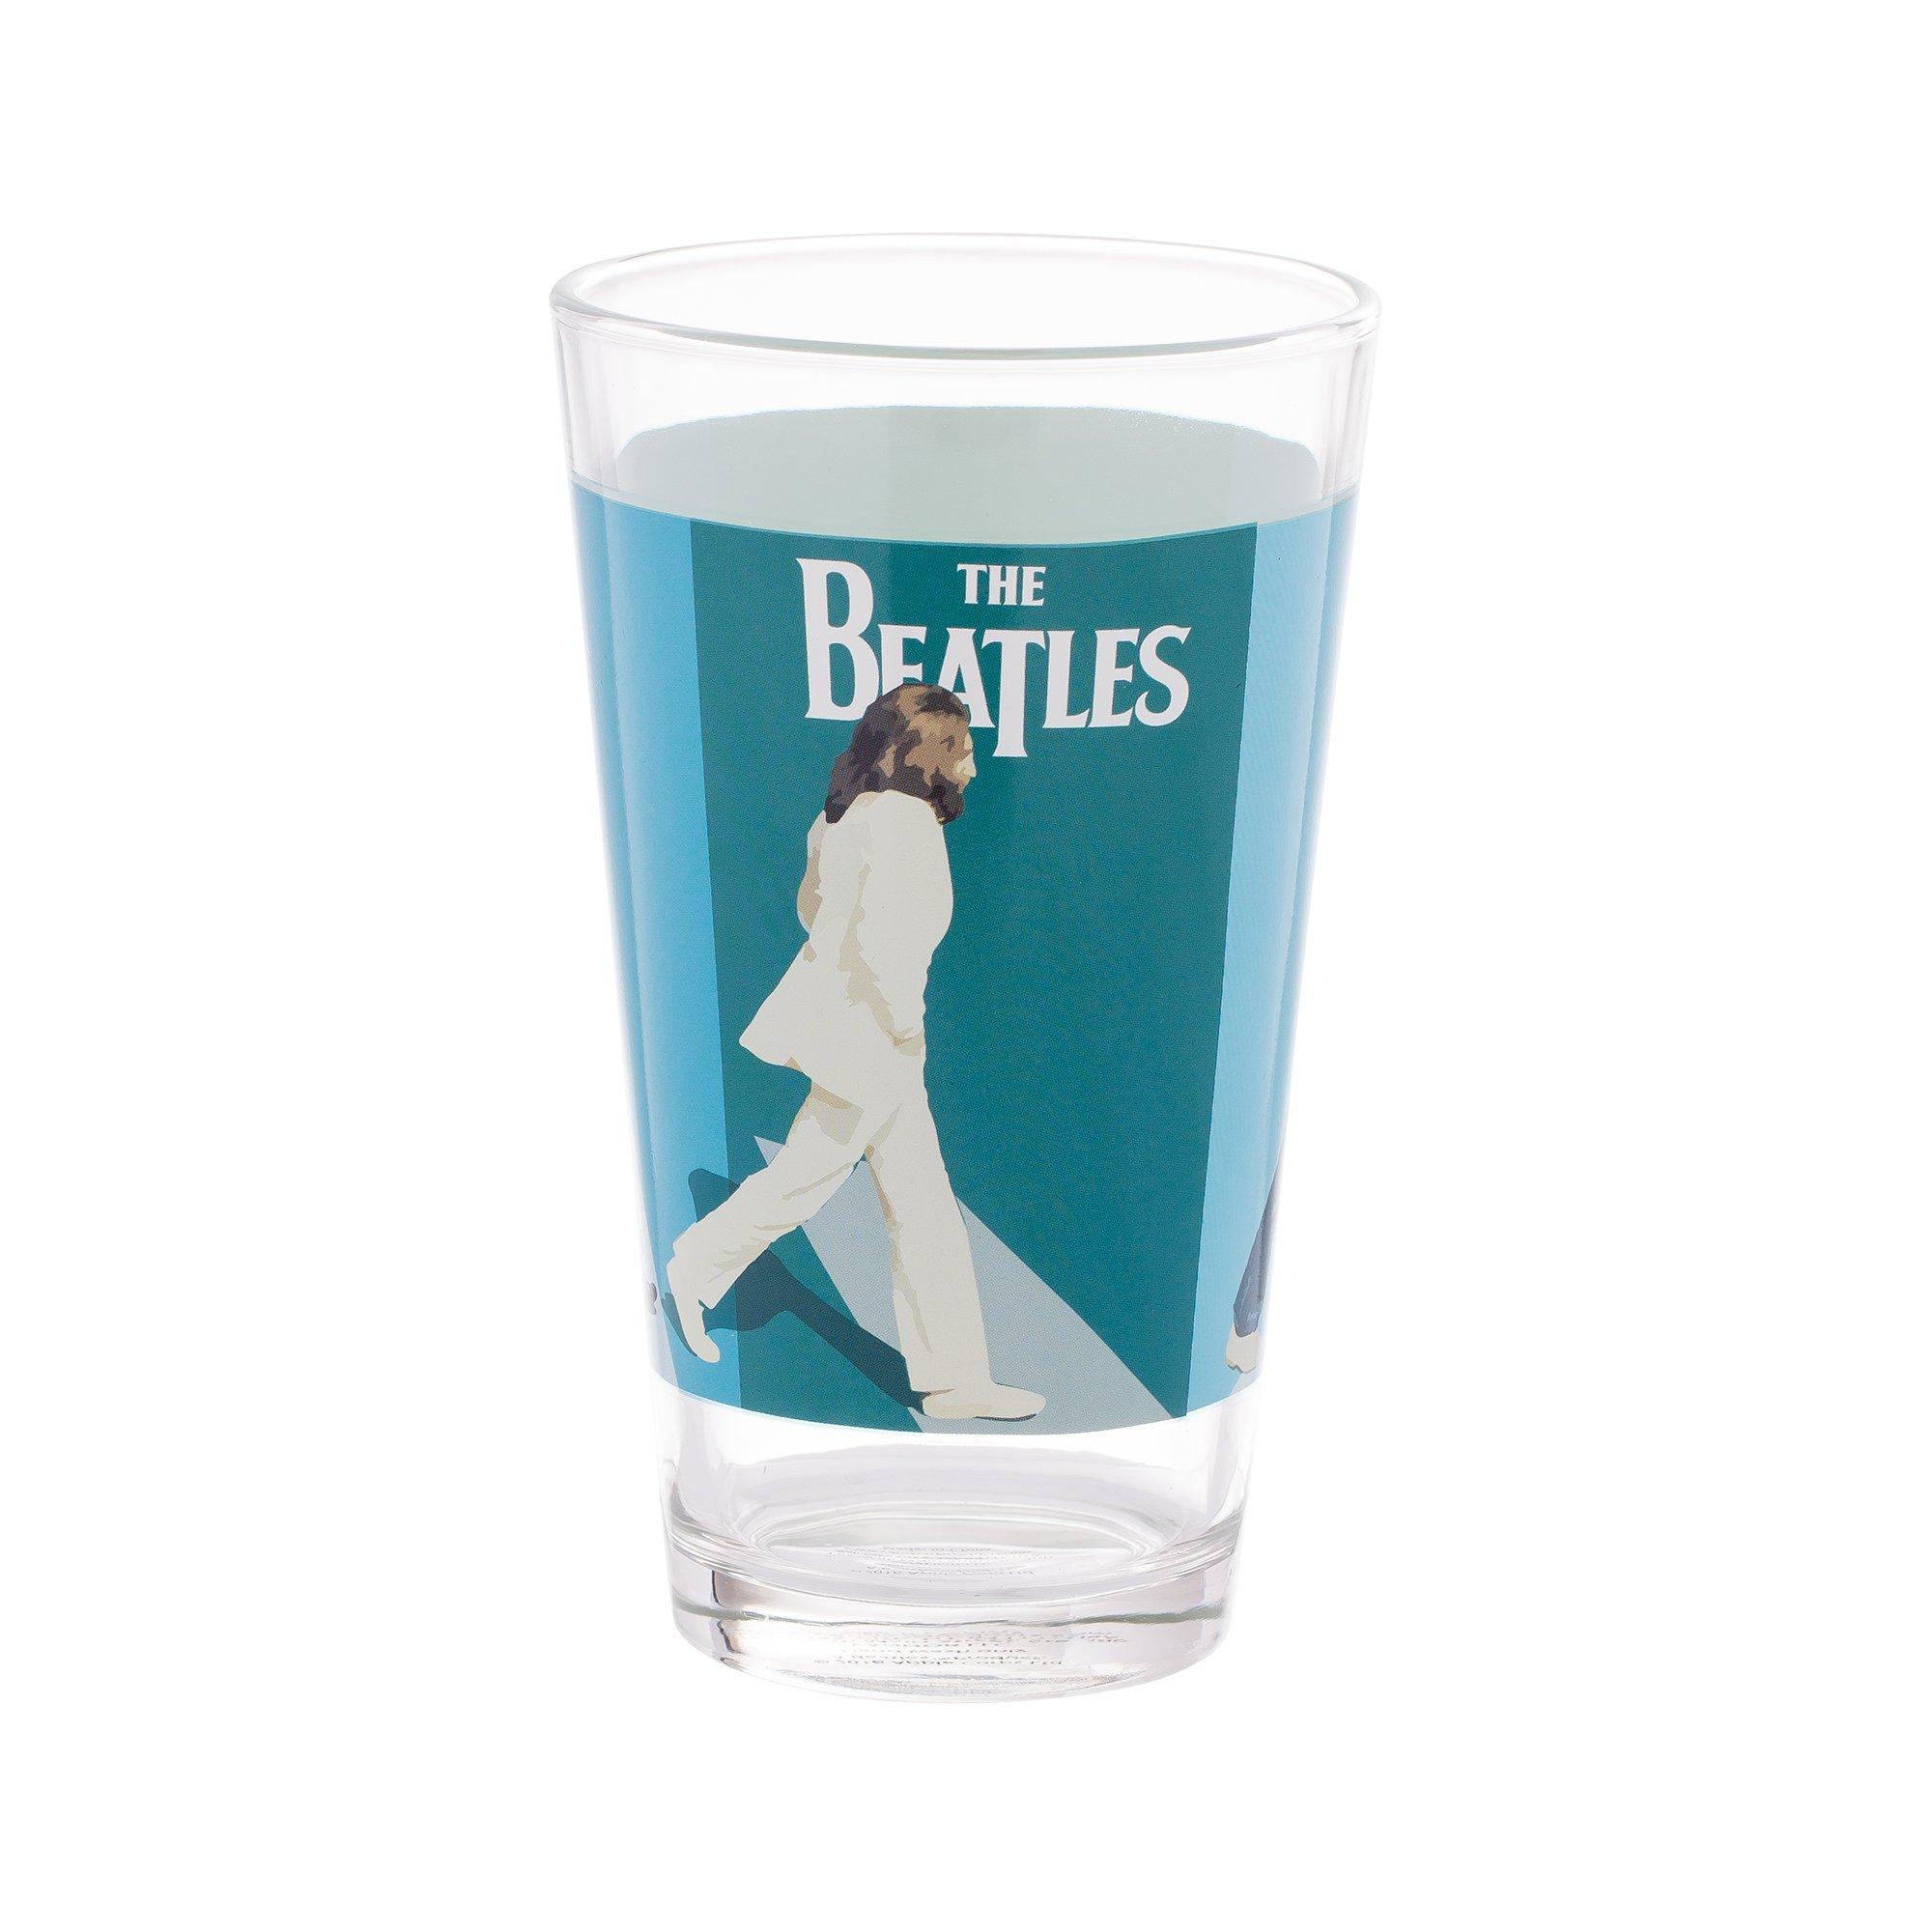 Vandor The Beatles Abbey Road 4 Piece 16 Ounce Glass Set (72012) by Vandor (Image #5)